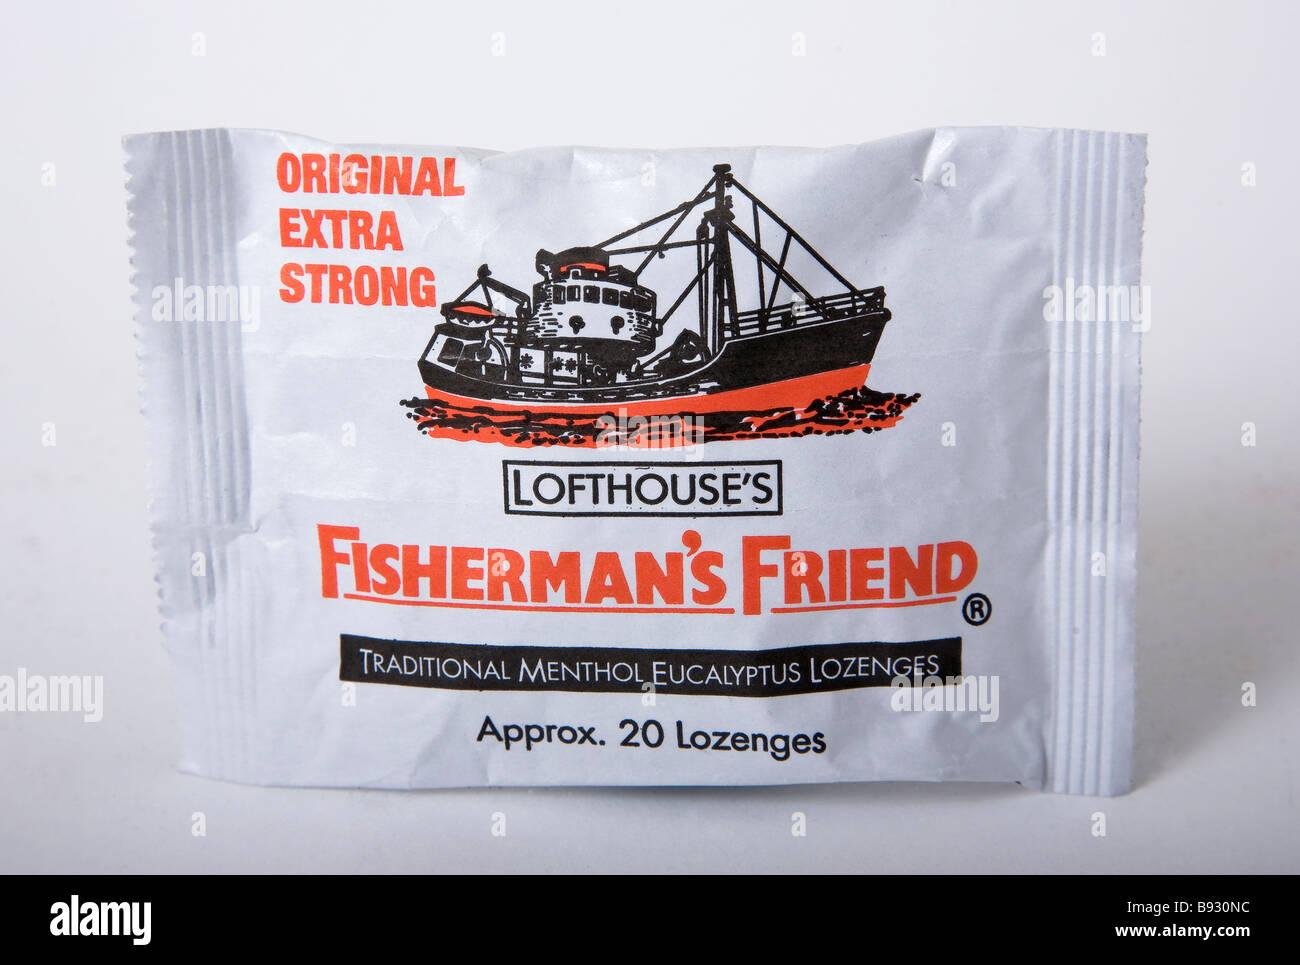 fisherman fisherman's friend original - Stock Image